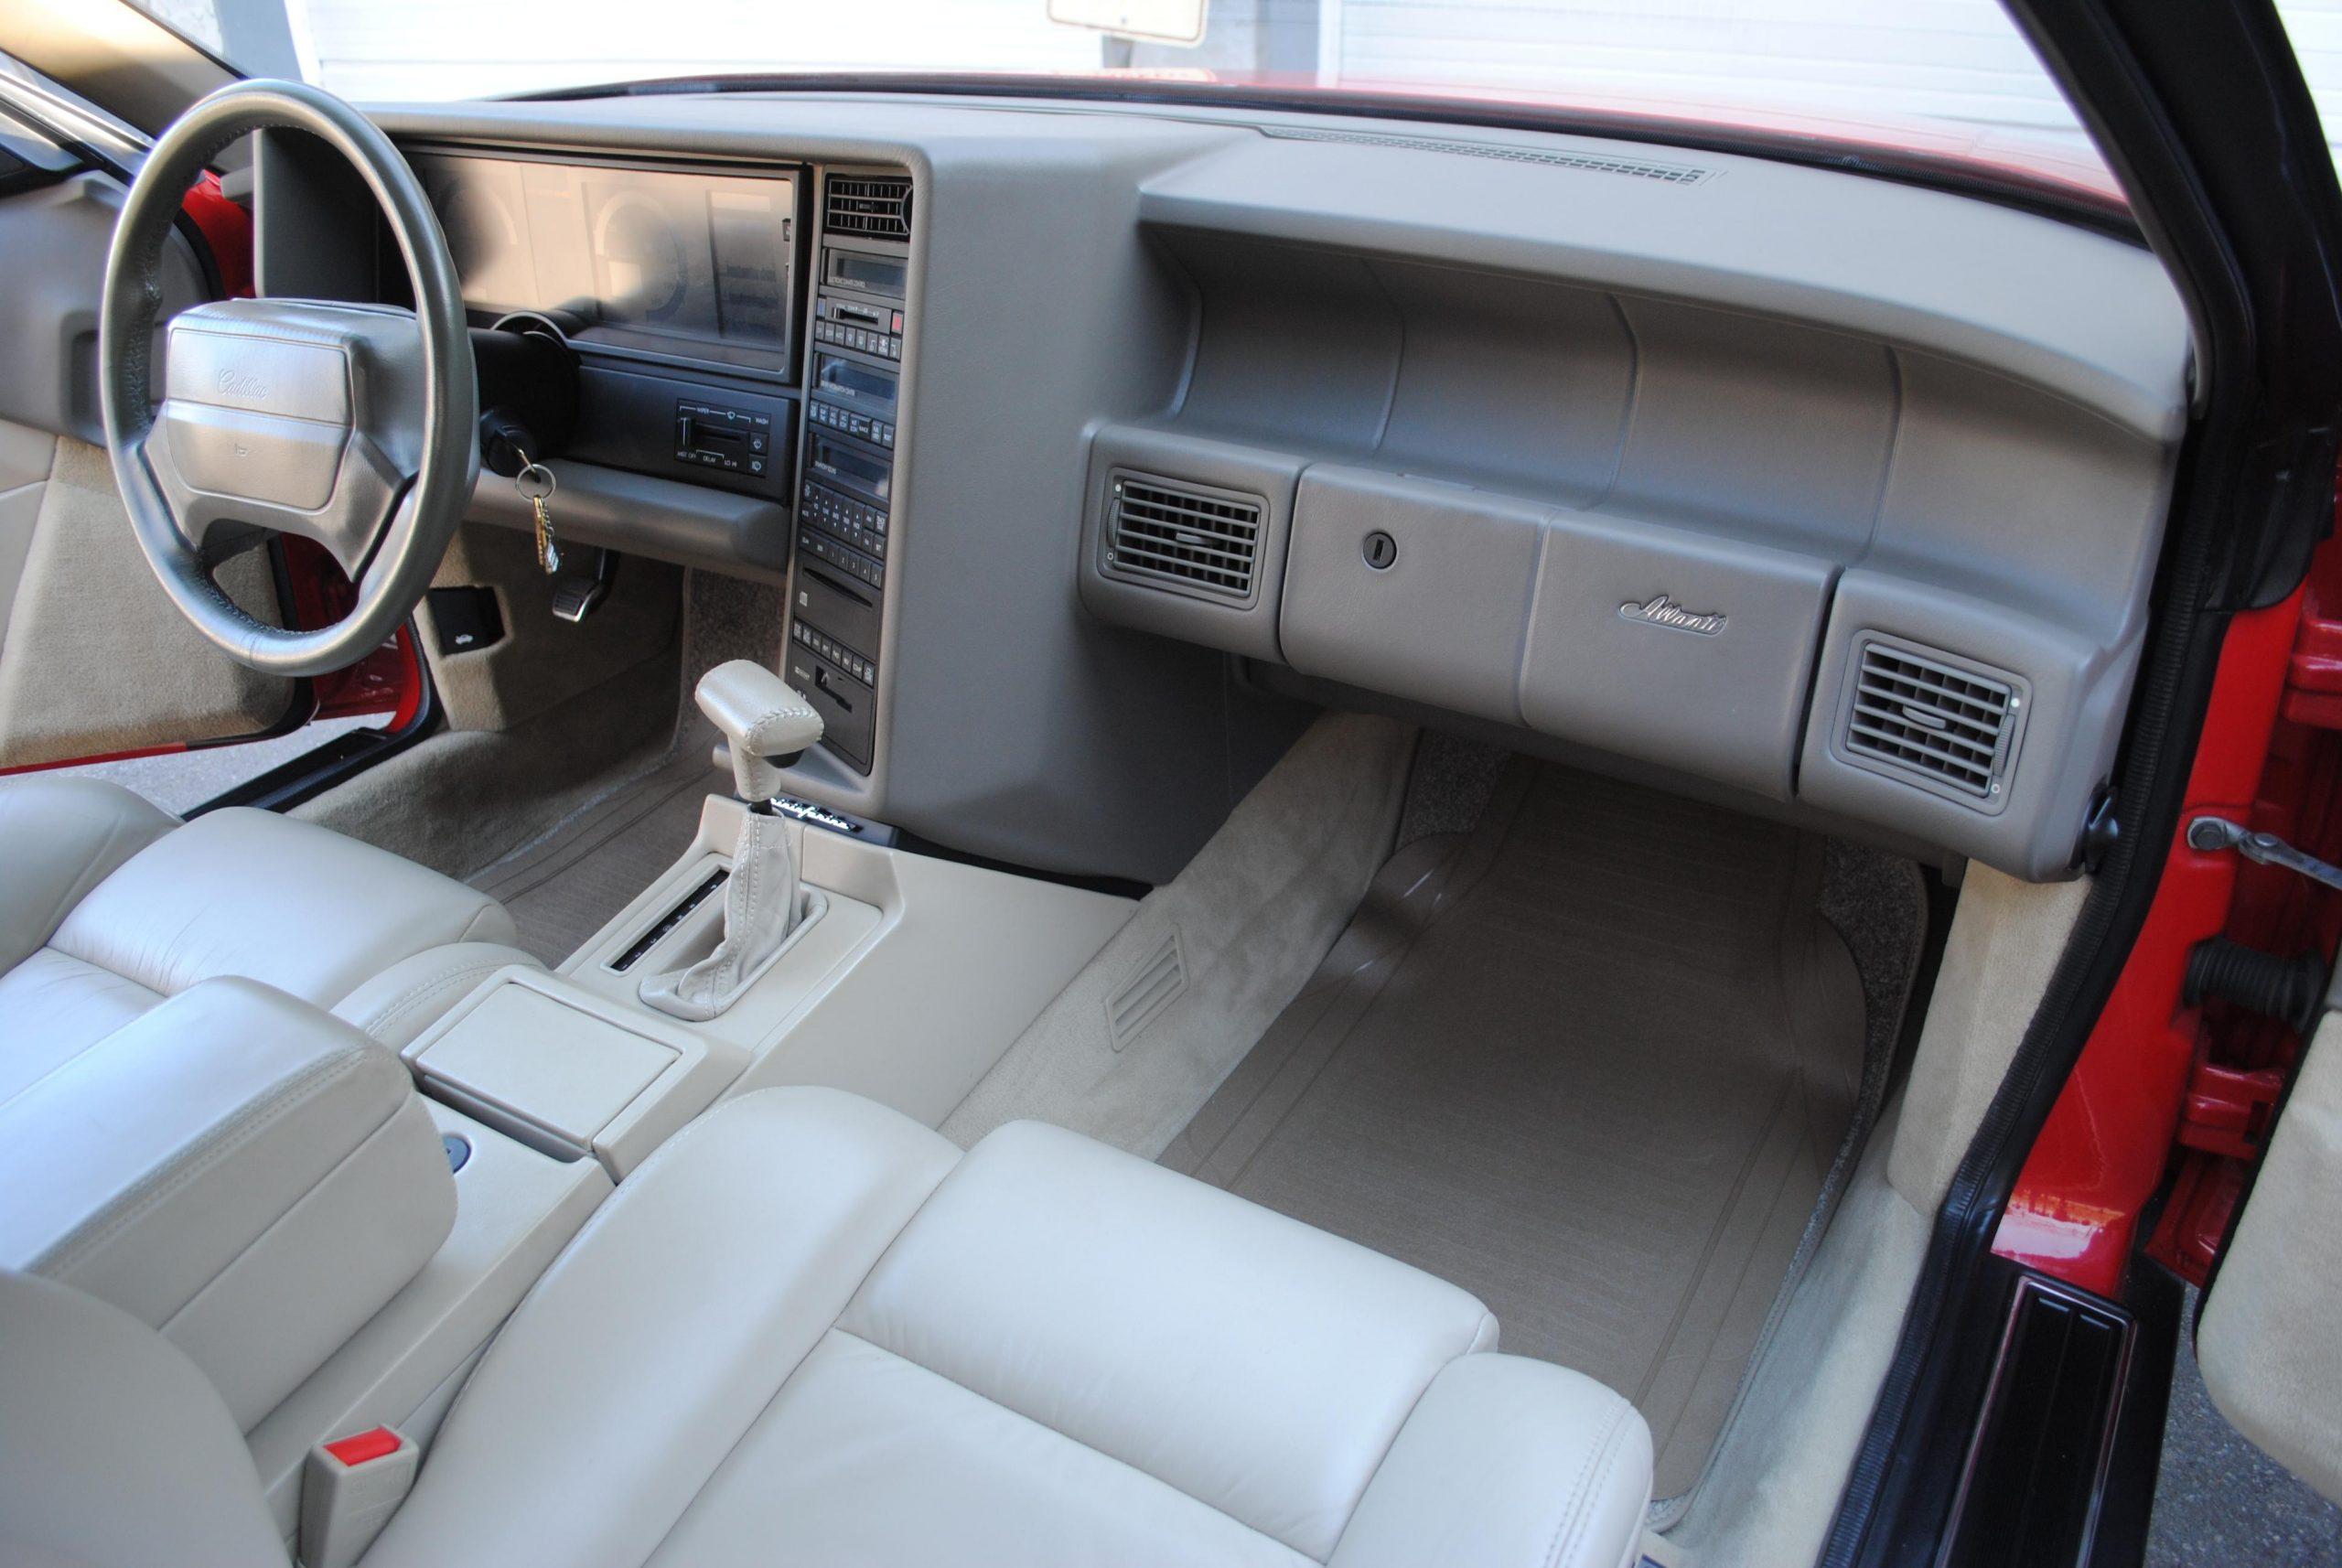 1993 Cadillac Allante interior front passenger side